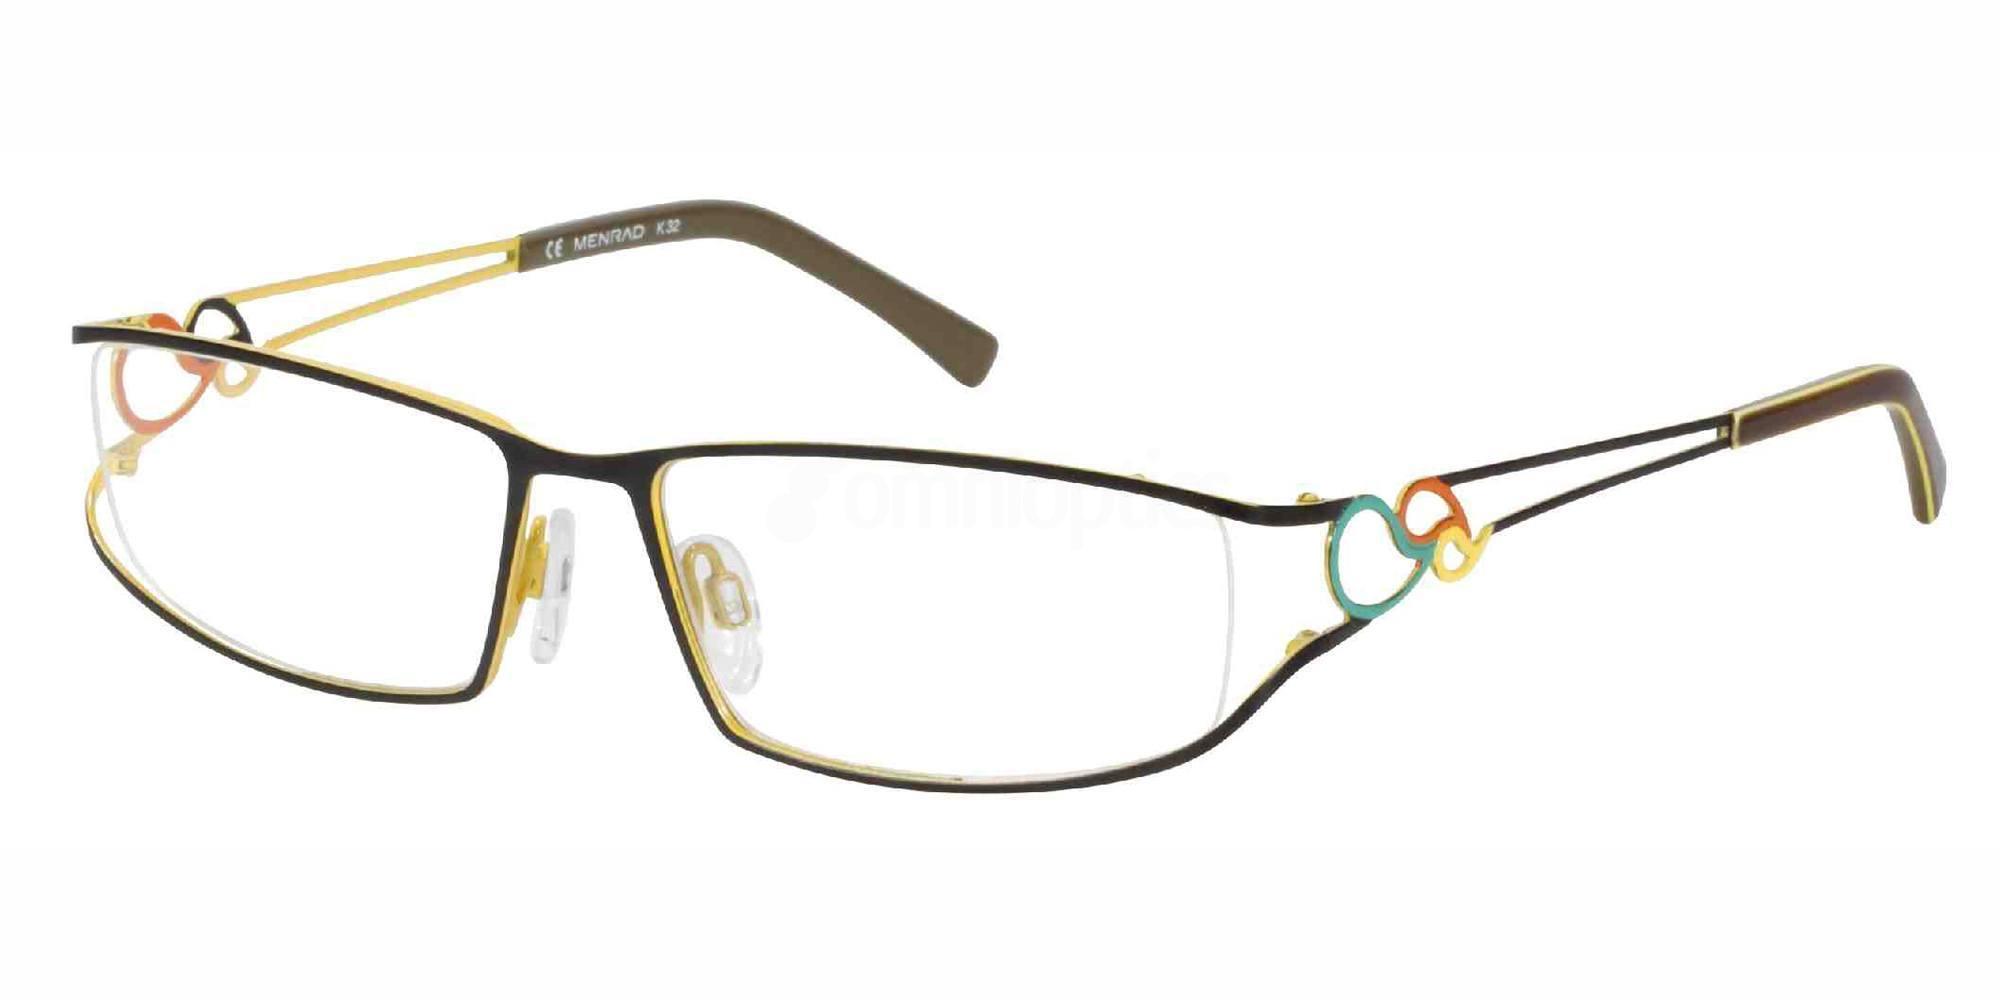 1512 13227 Glasses, MENRAD Eyewear